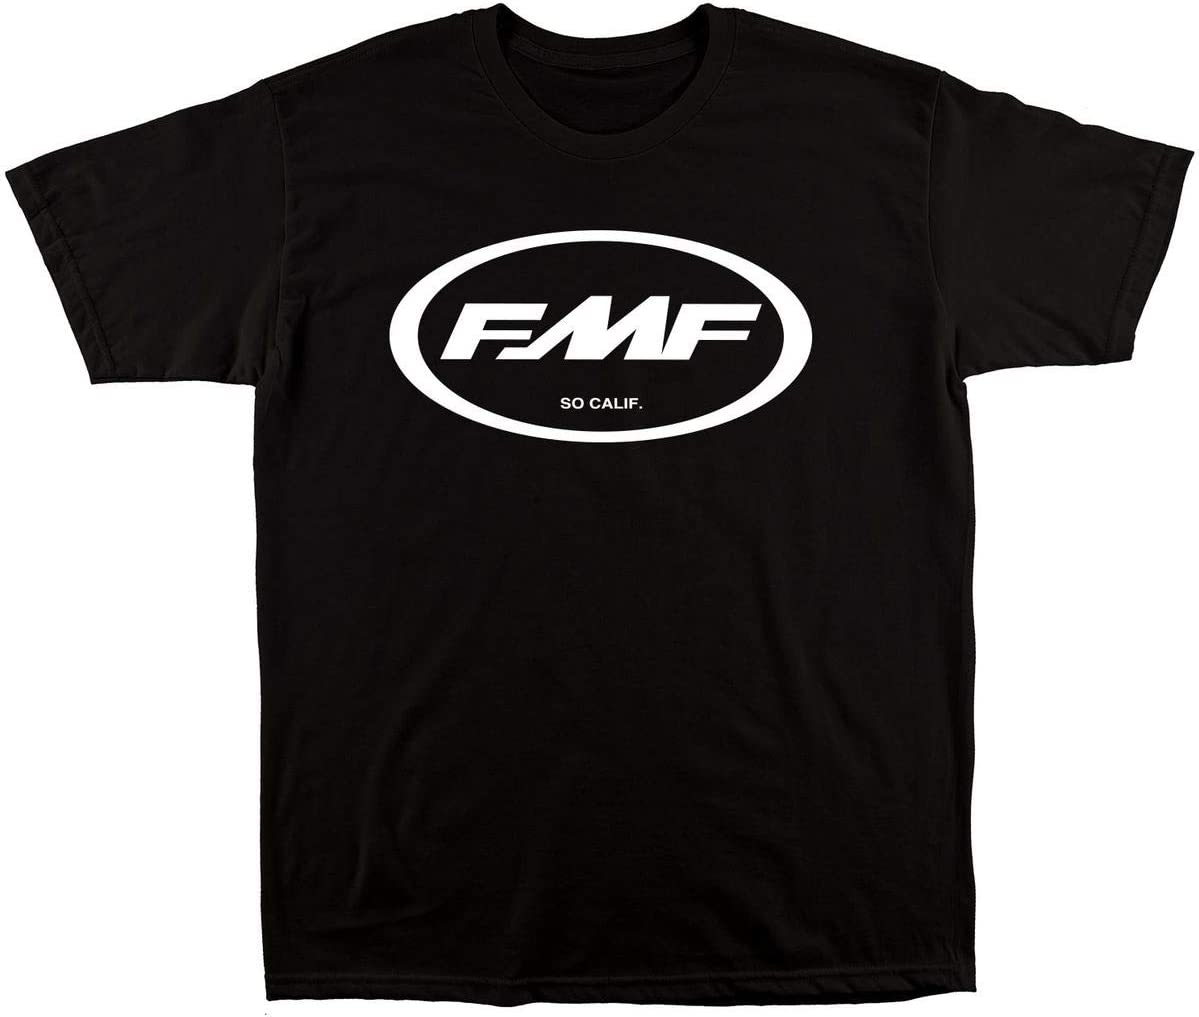 Medium FMF Factory Classic Don 2 T-Shirt Black//White